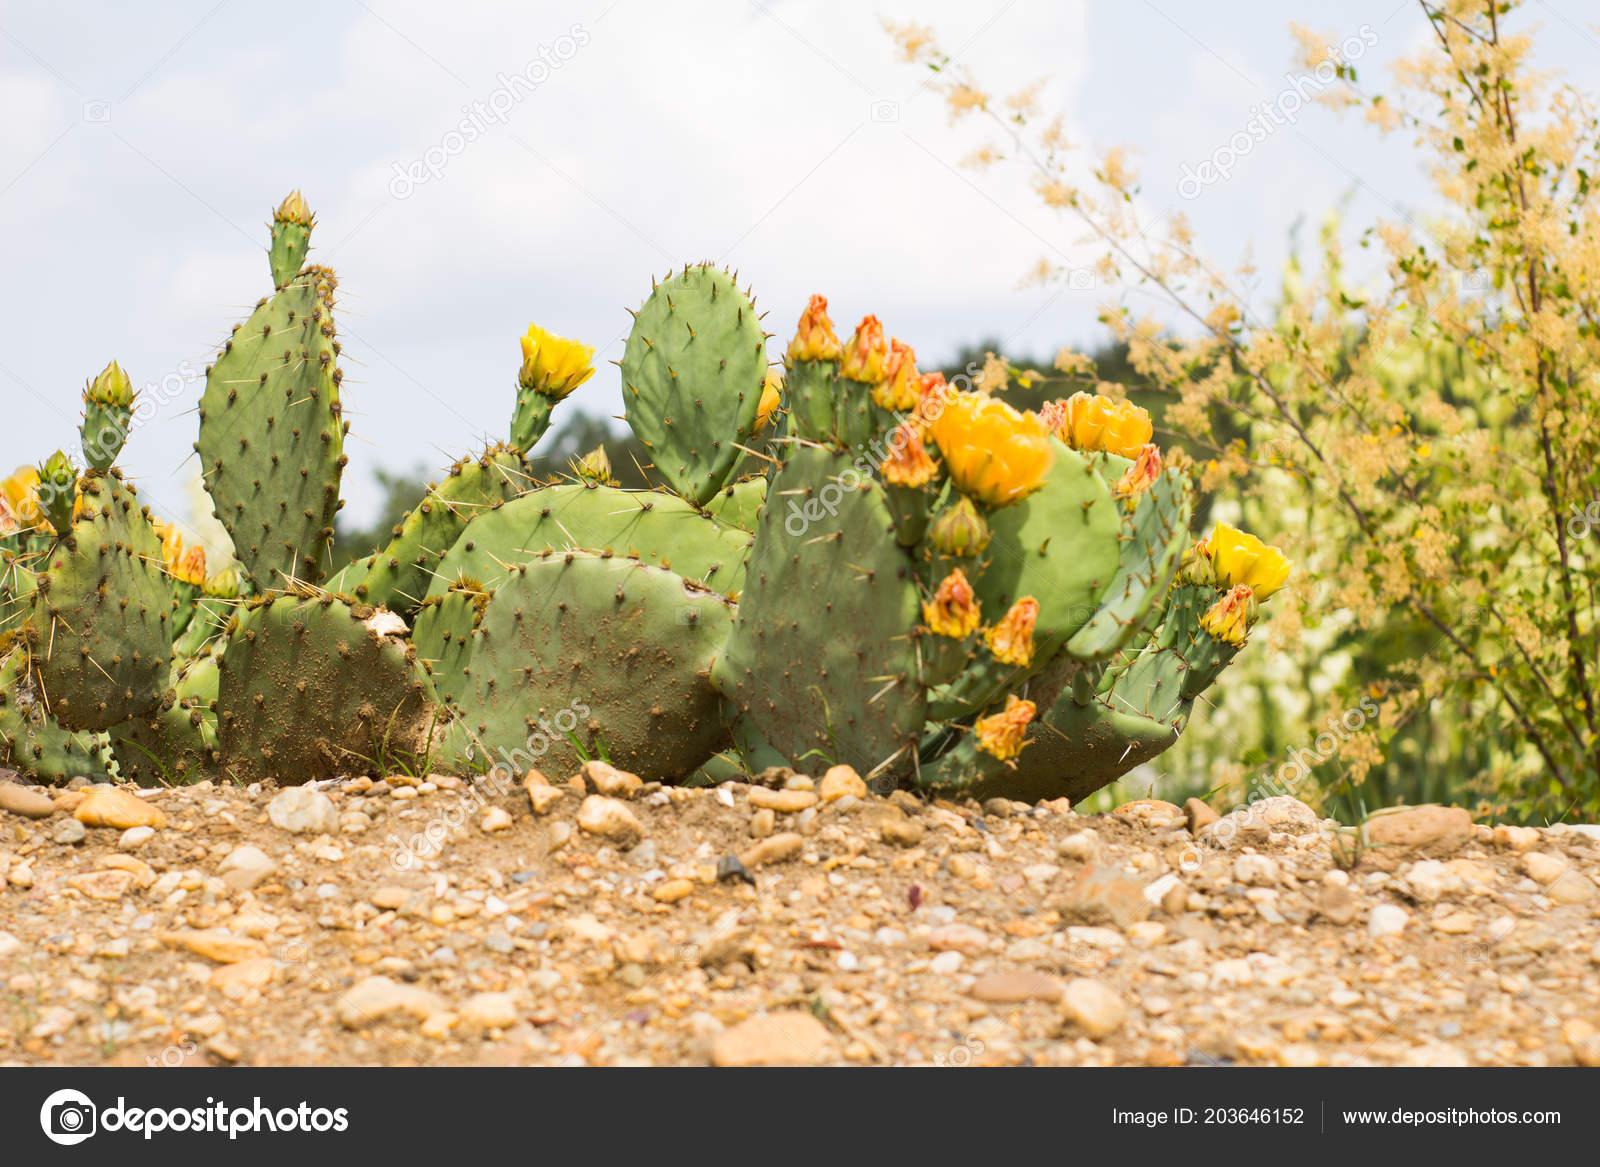 Succulents Natural Habitat Cactus Desert Outdoors — Stock